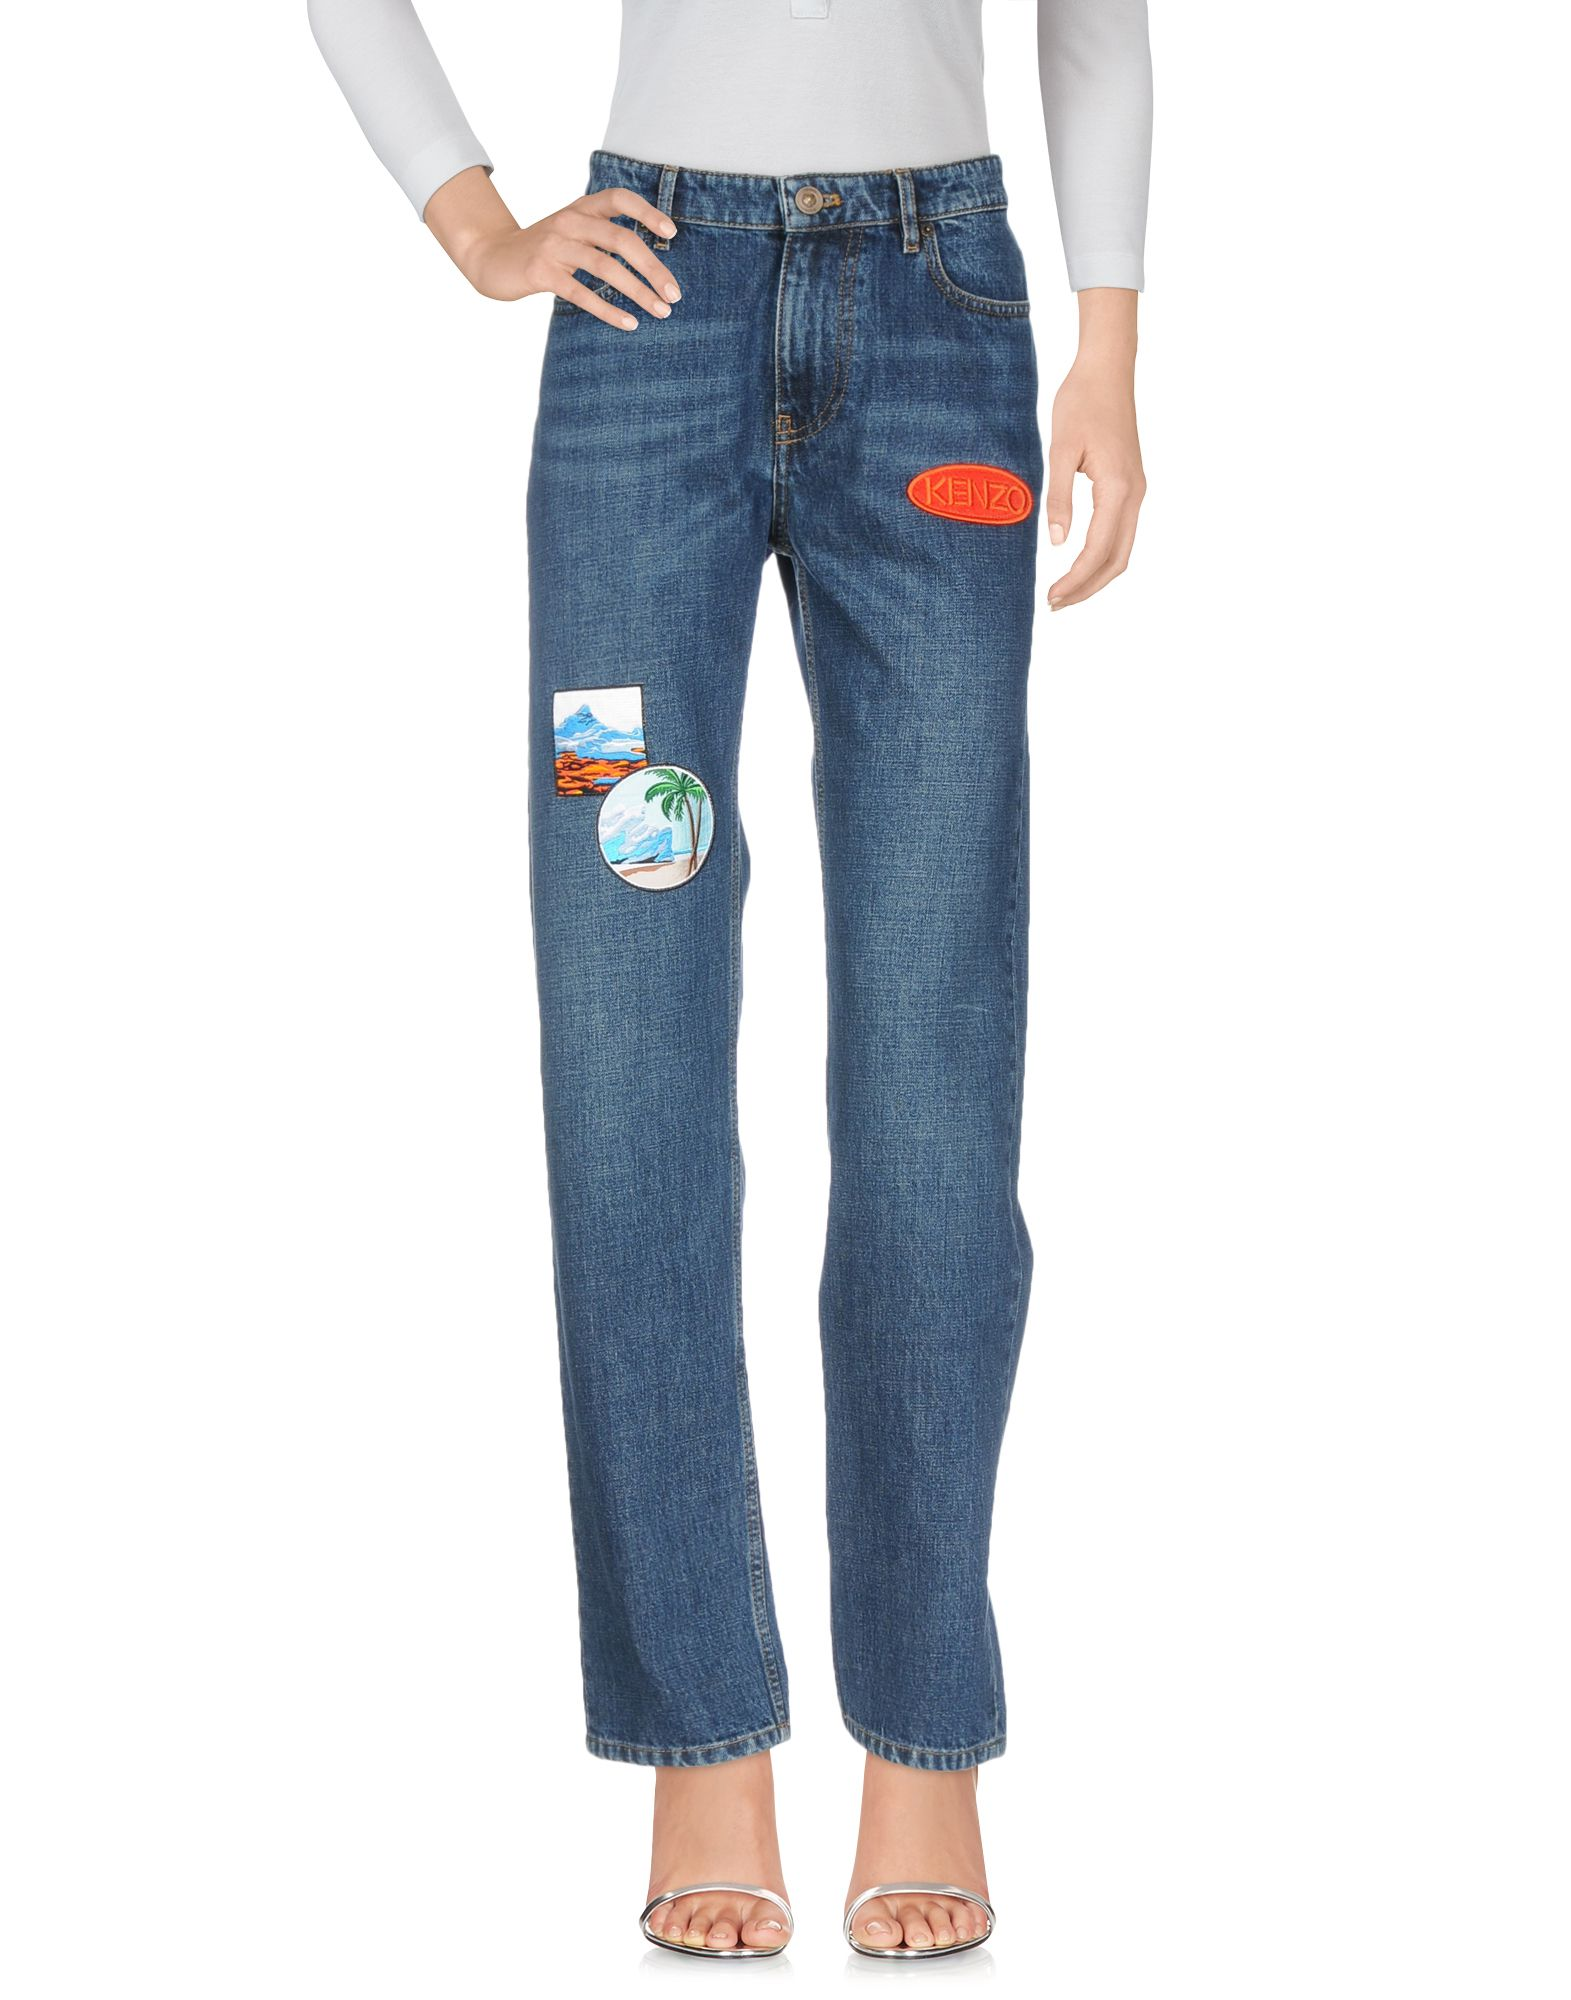 Pantaloni Jeans Kenzo Donna - Acquista online su aHLDrKek